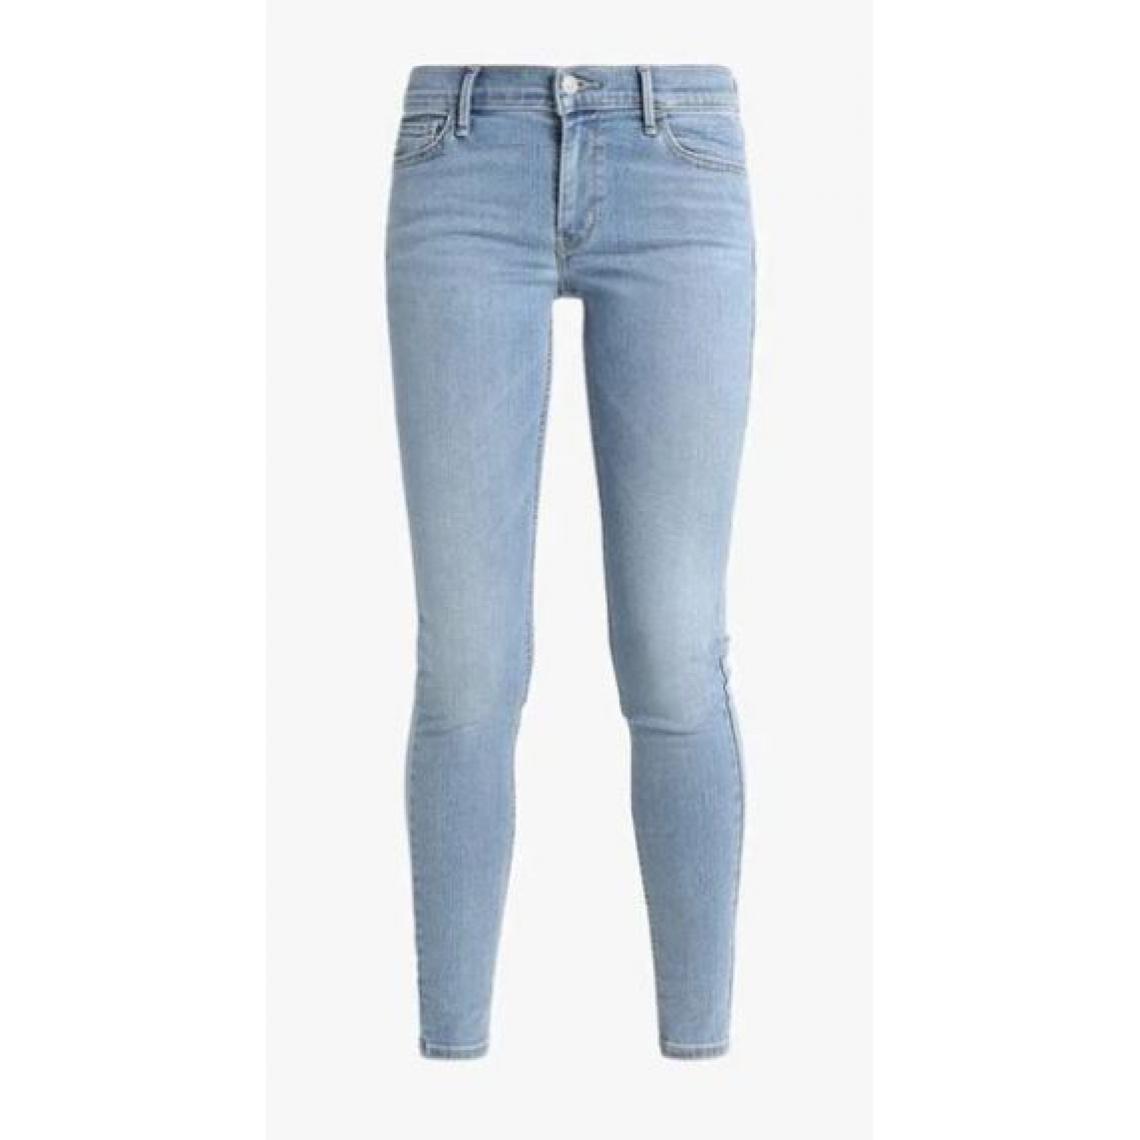 Jean innovation super skinny bleu - Levi's - Modalova